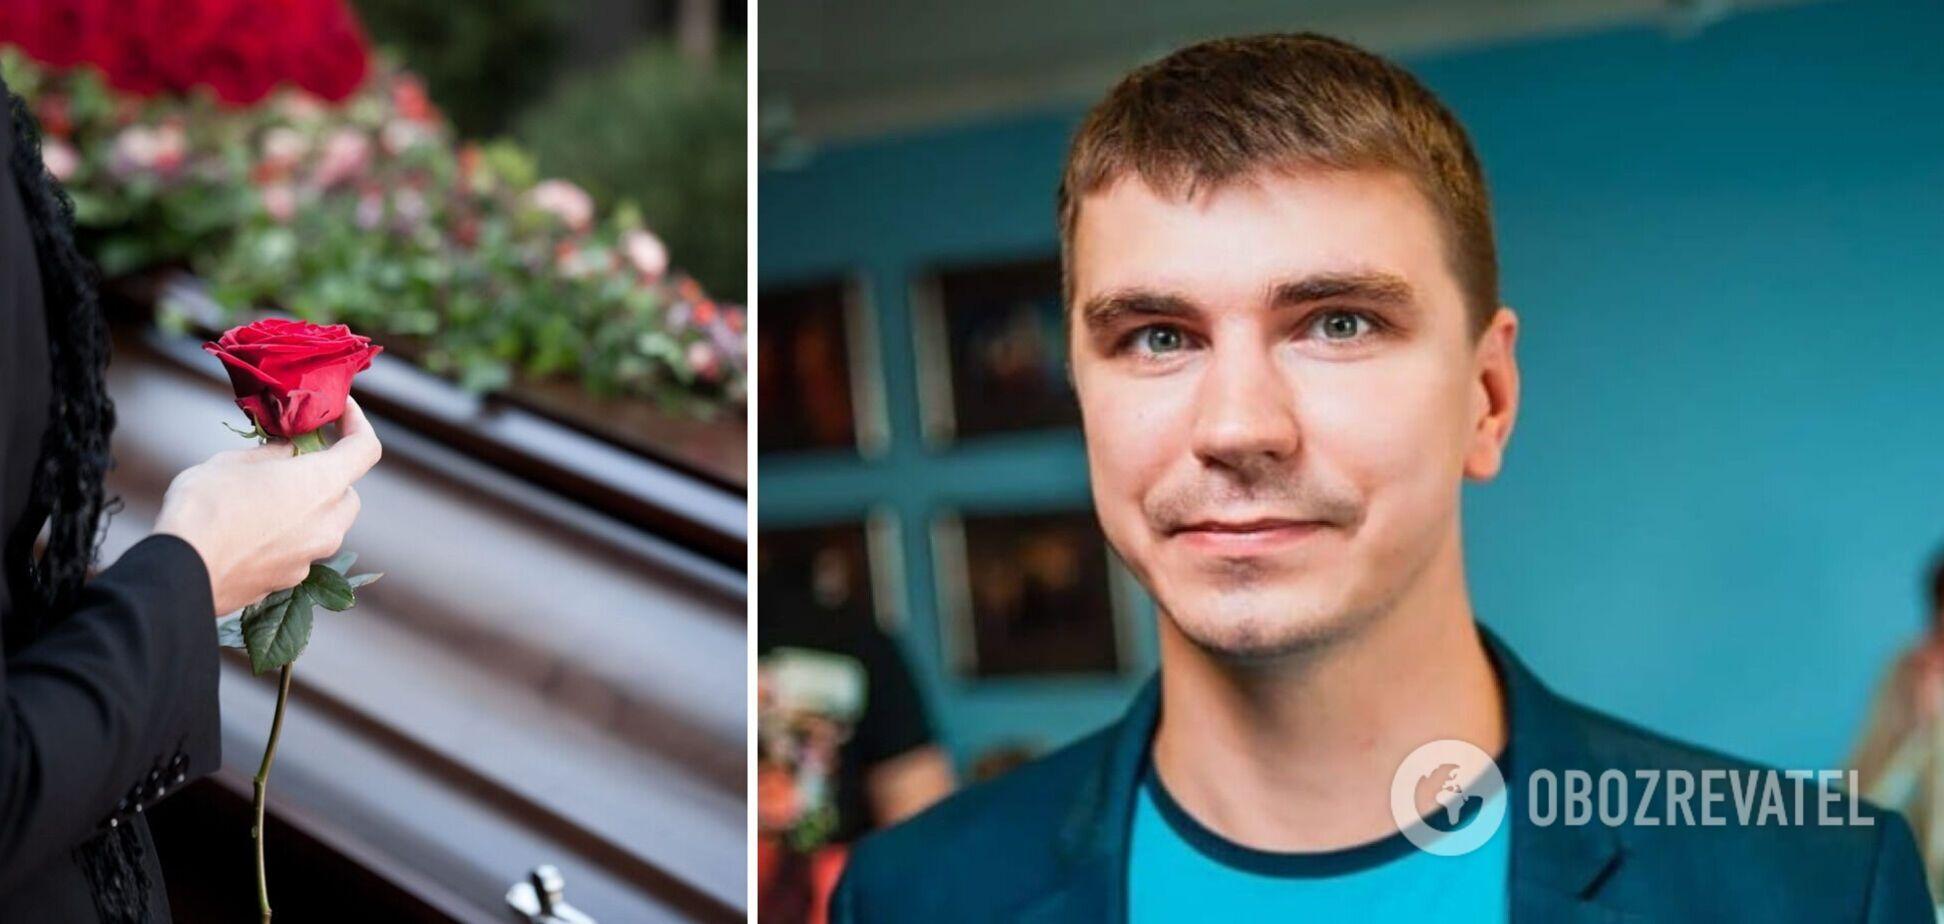 В Чернигове похоронили нардепа Антона Полякова. Фото, видео и все подробности